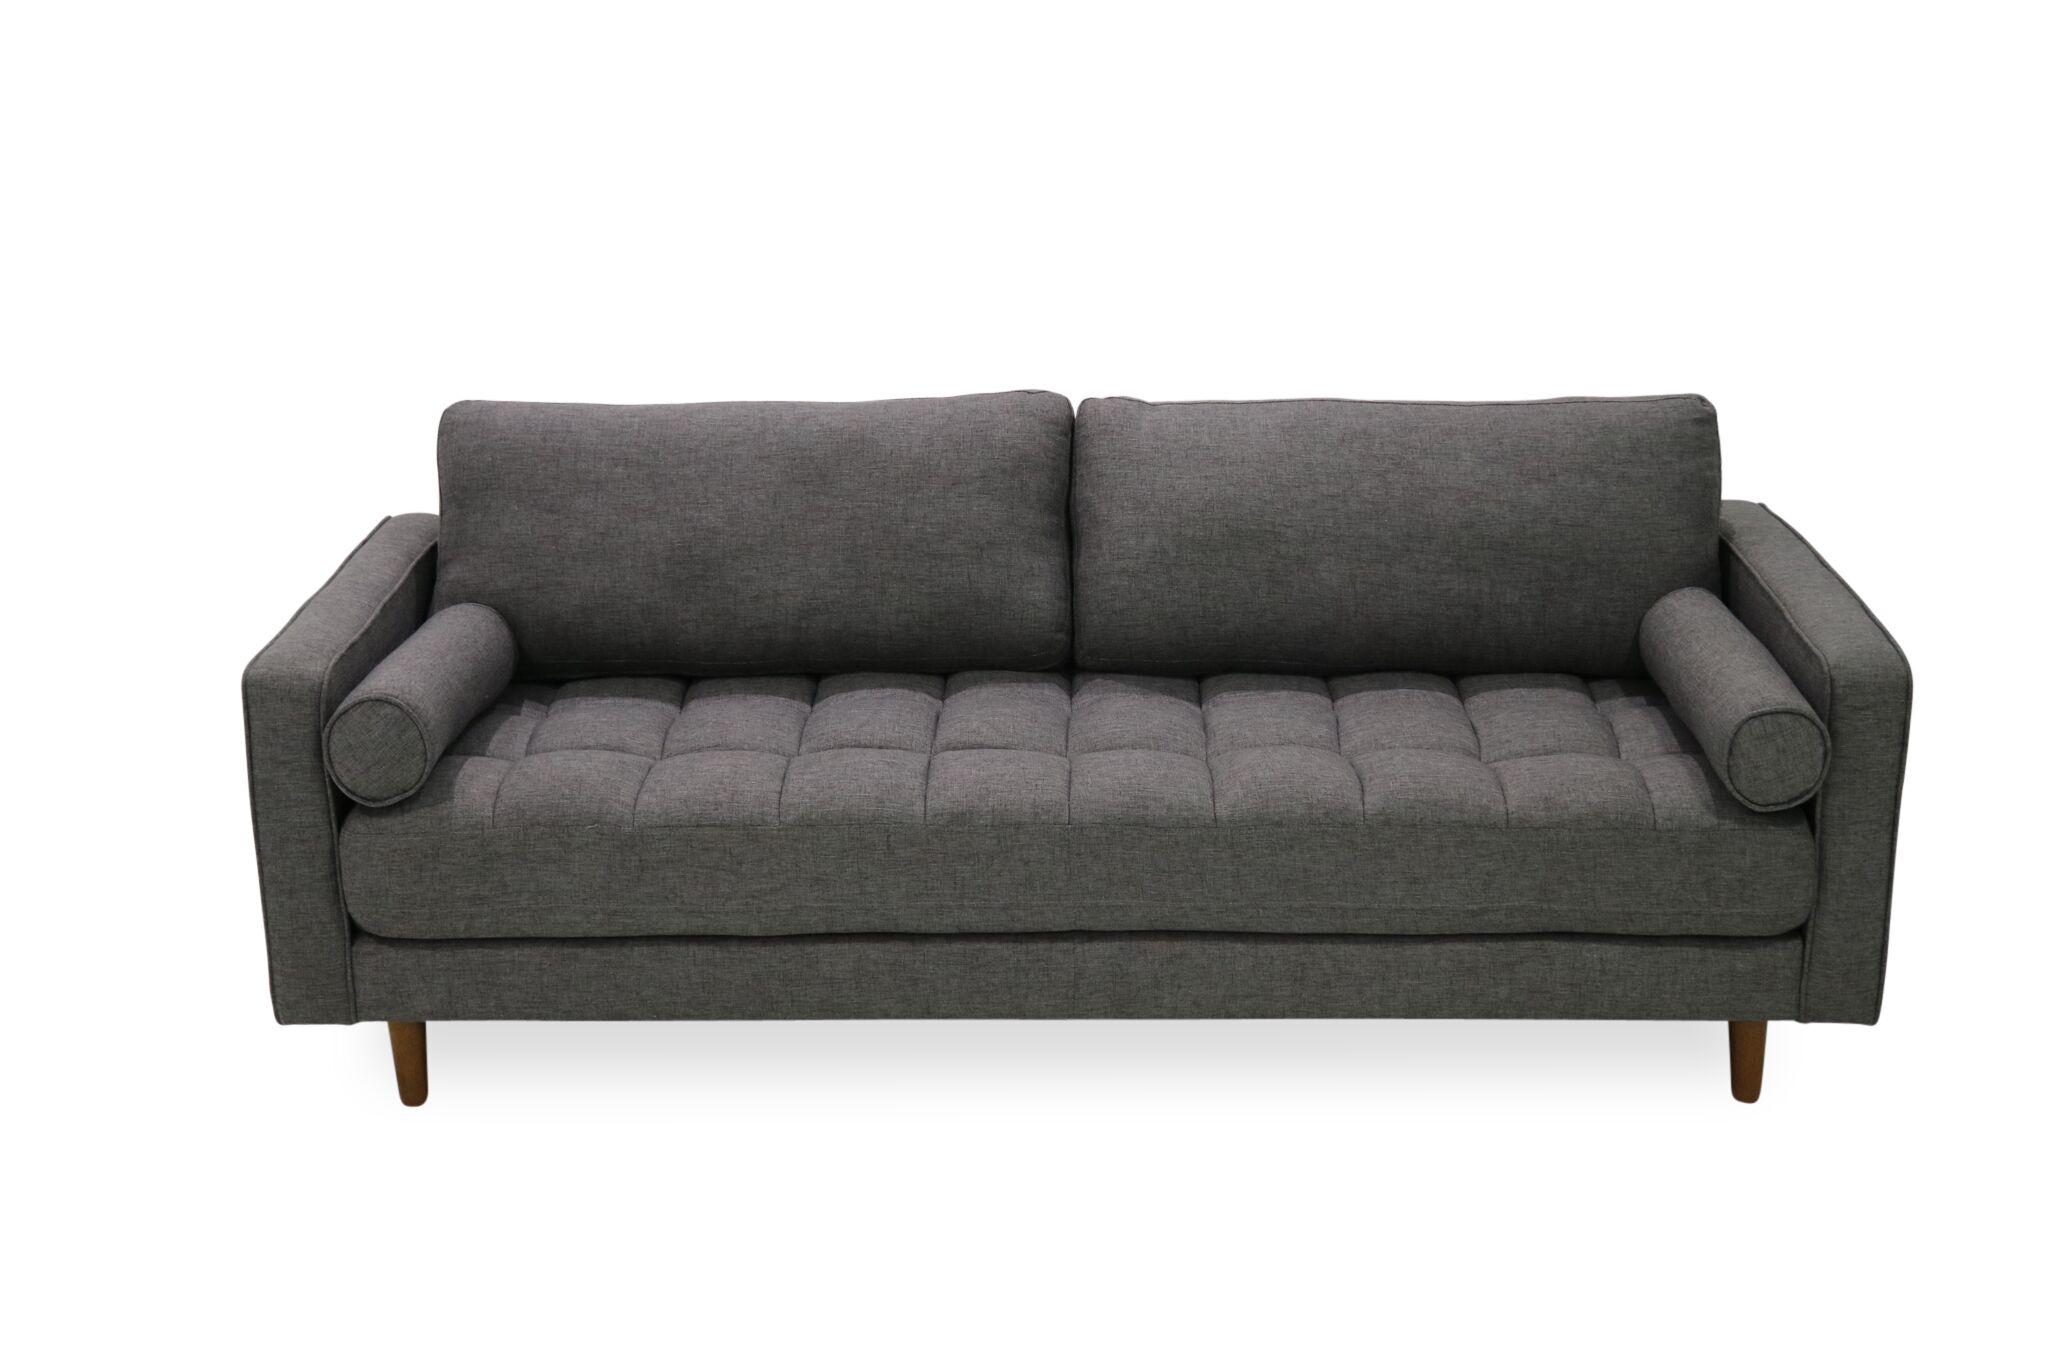 Gafford Sofa Upholstery: Seaside Gray